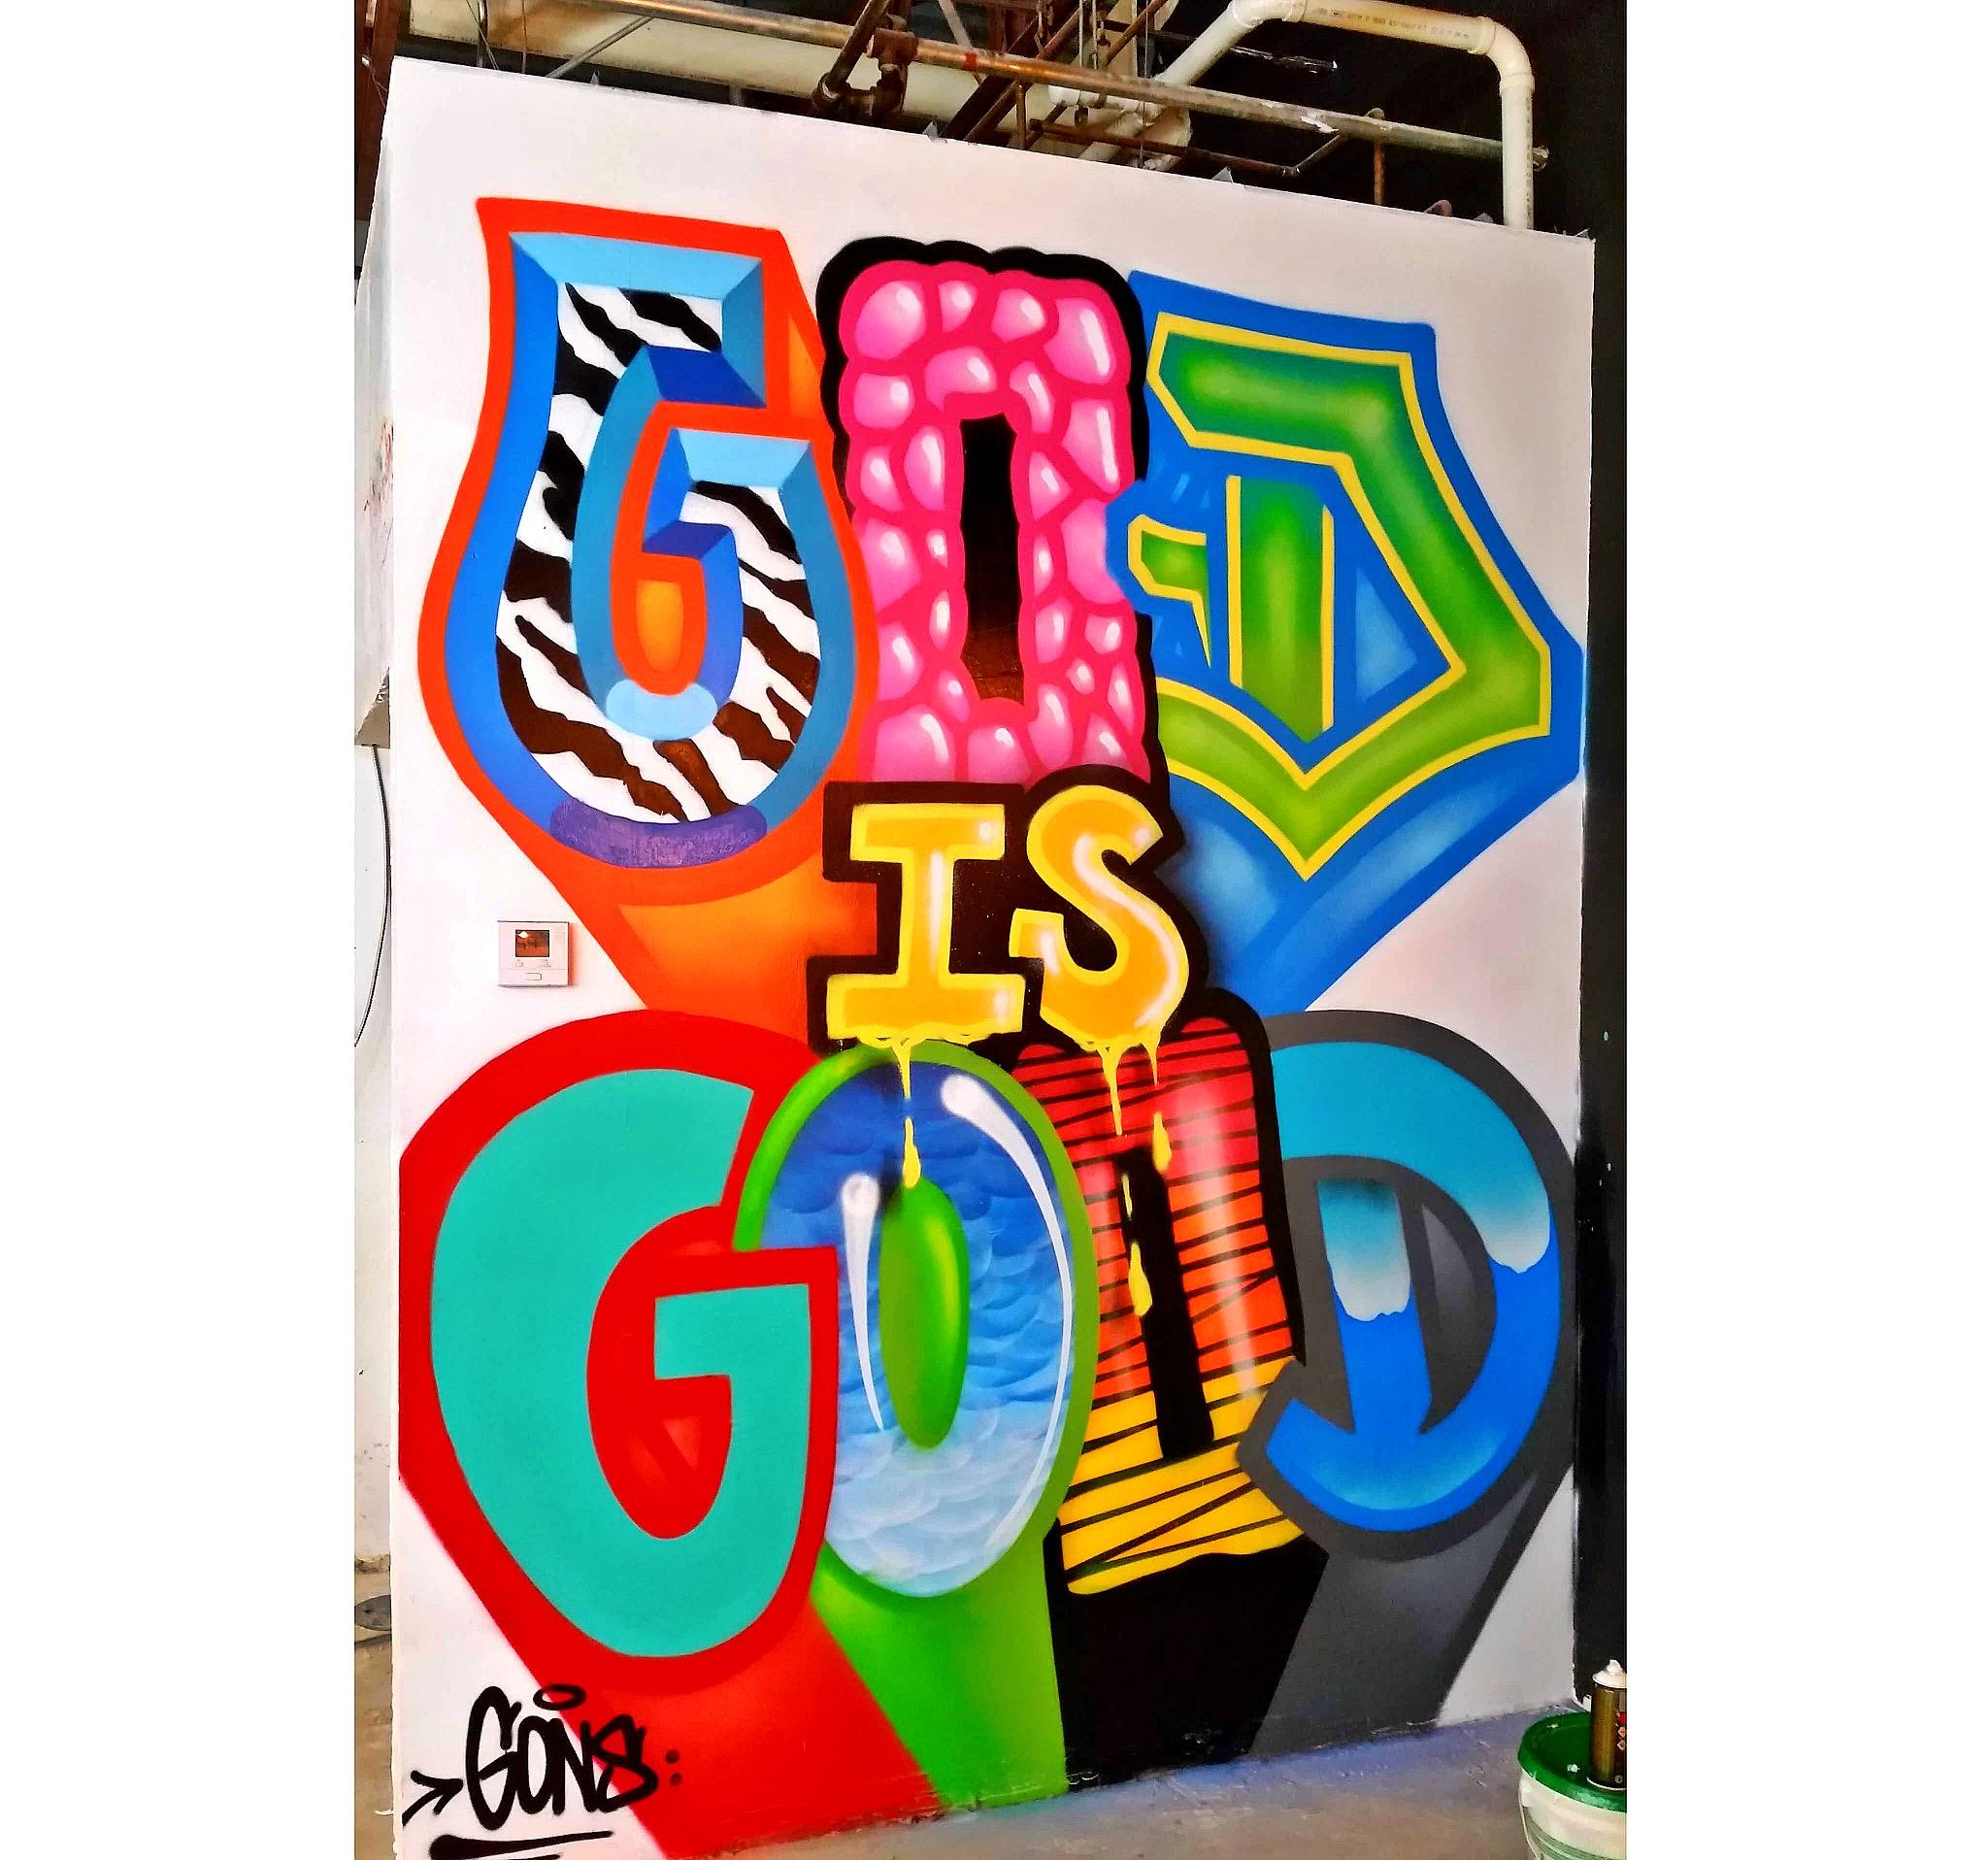 God is Good mural for The Spot barbershop Little Havana, Fl